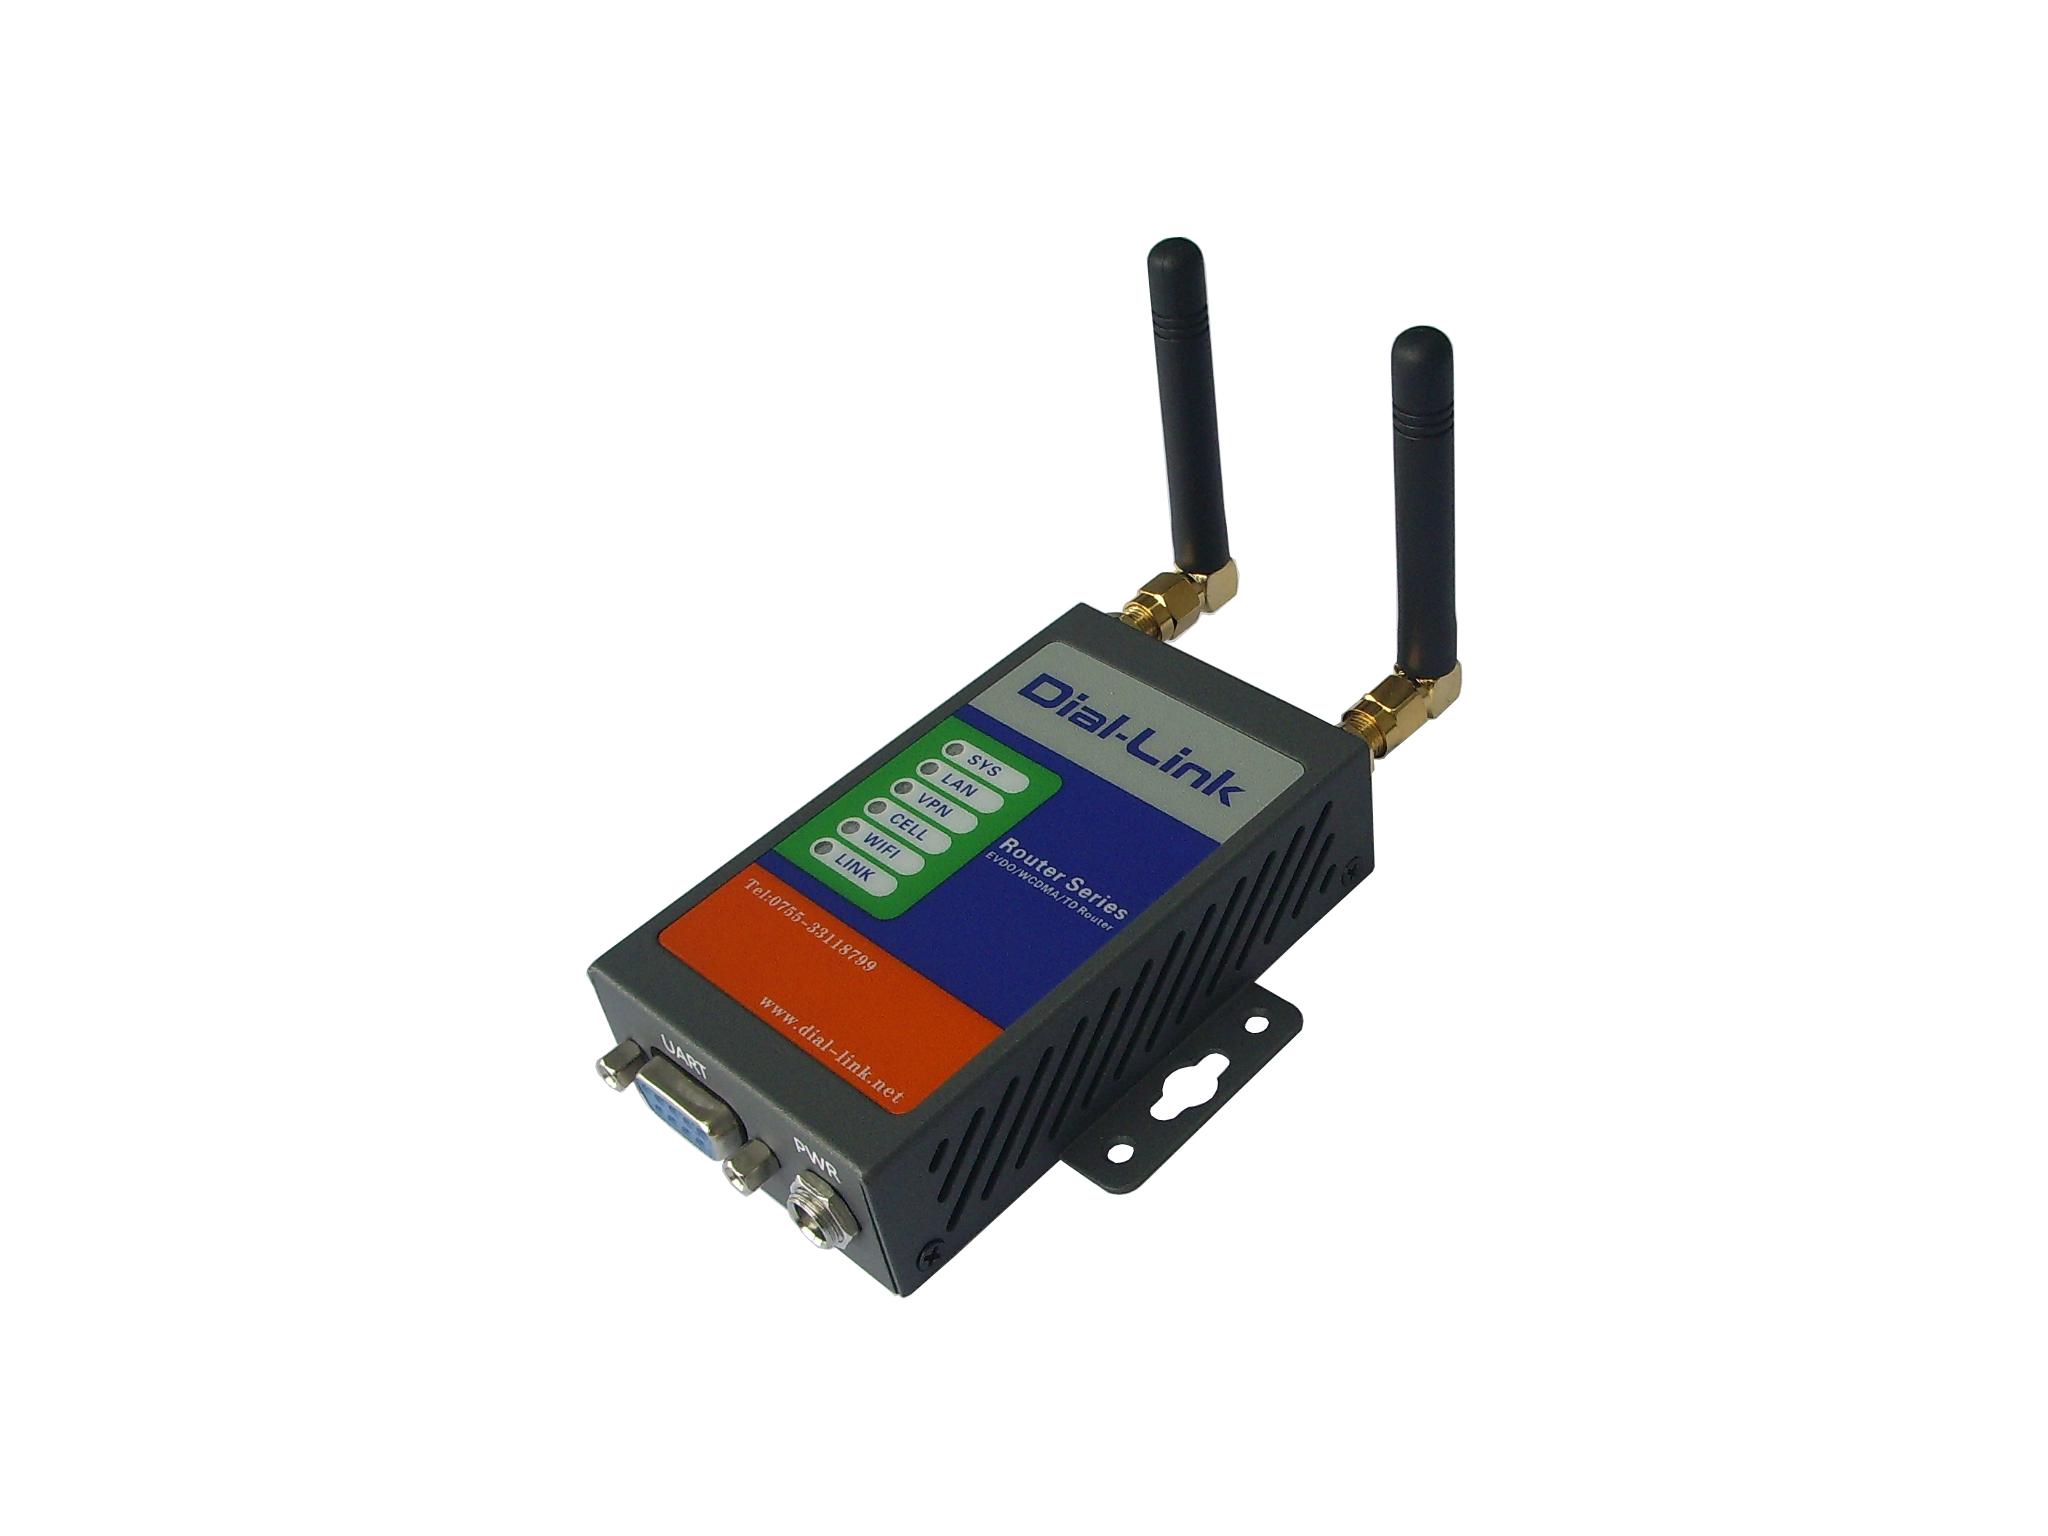 DLK-R870W全网工业wifi无线路由器